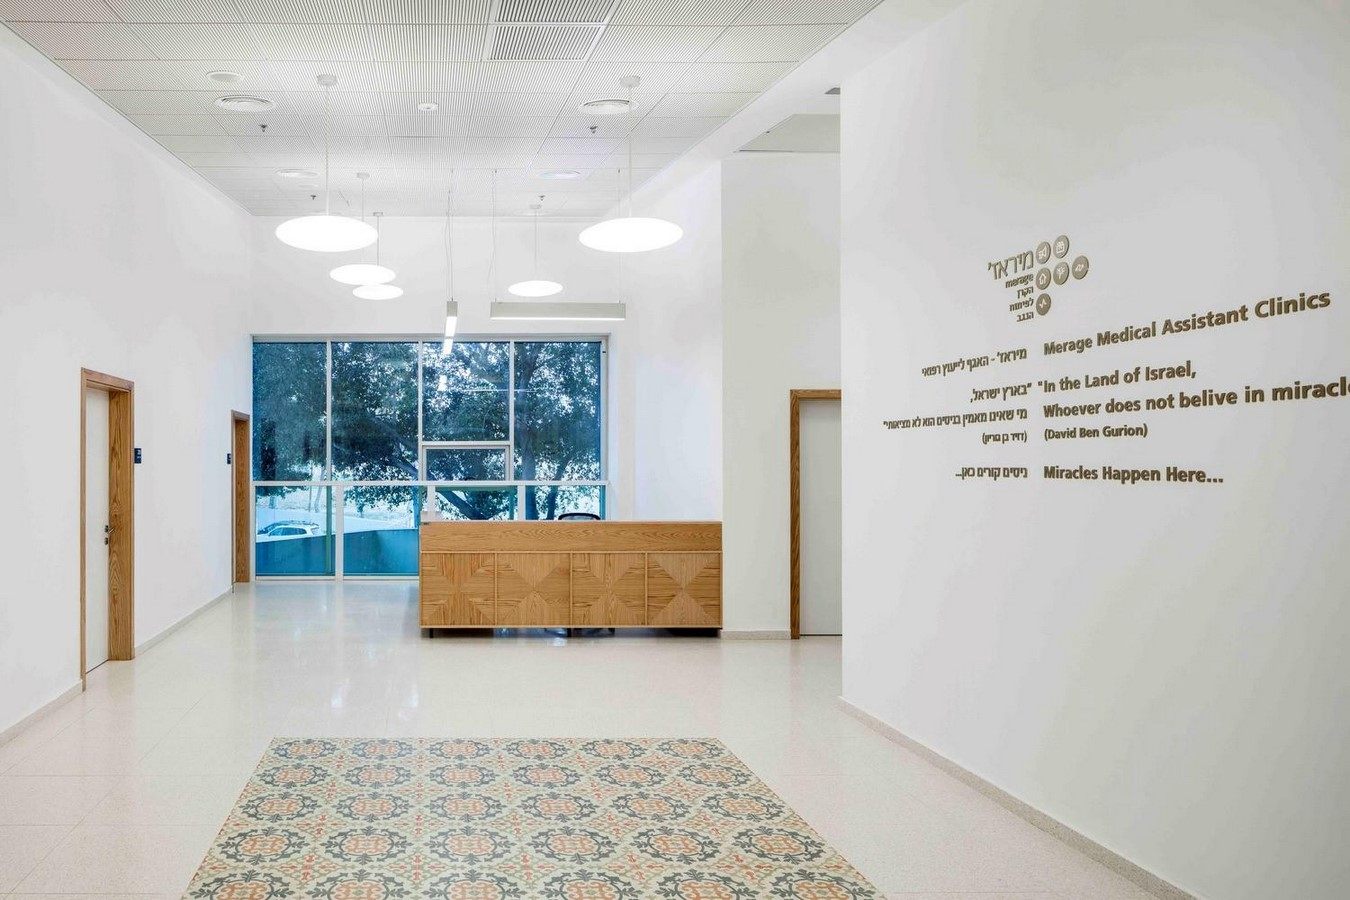 Ezra Lemarpe Medical Rehabilitation Center, Israel - Sheet2